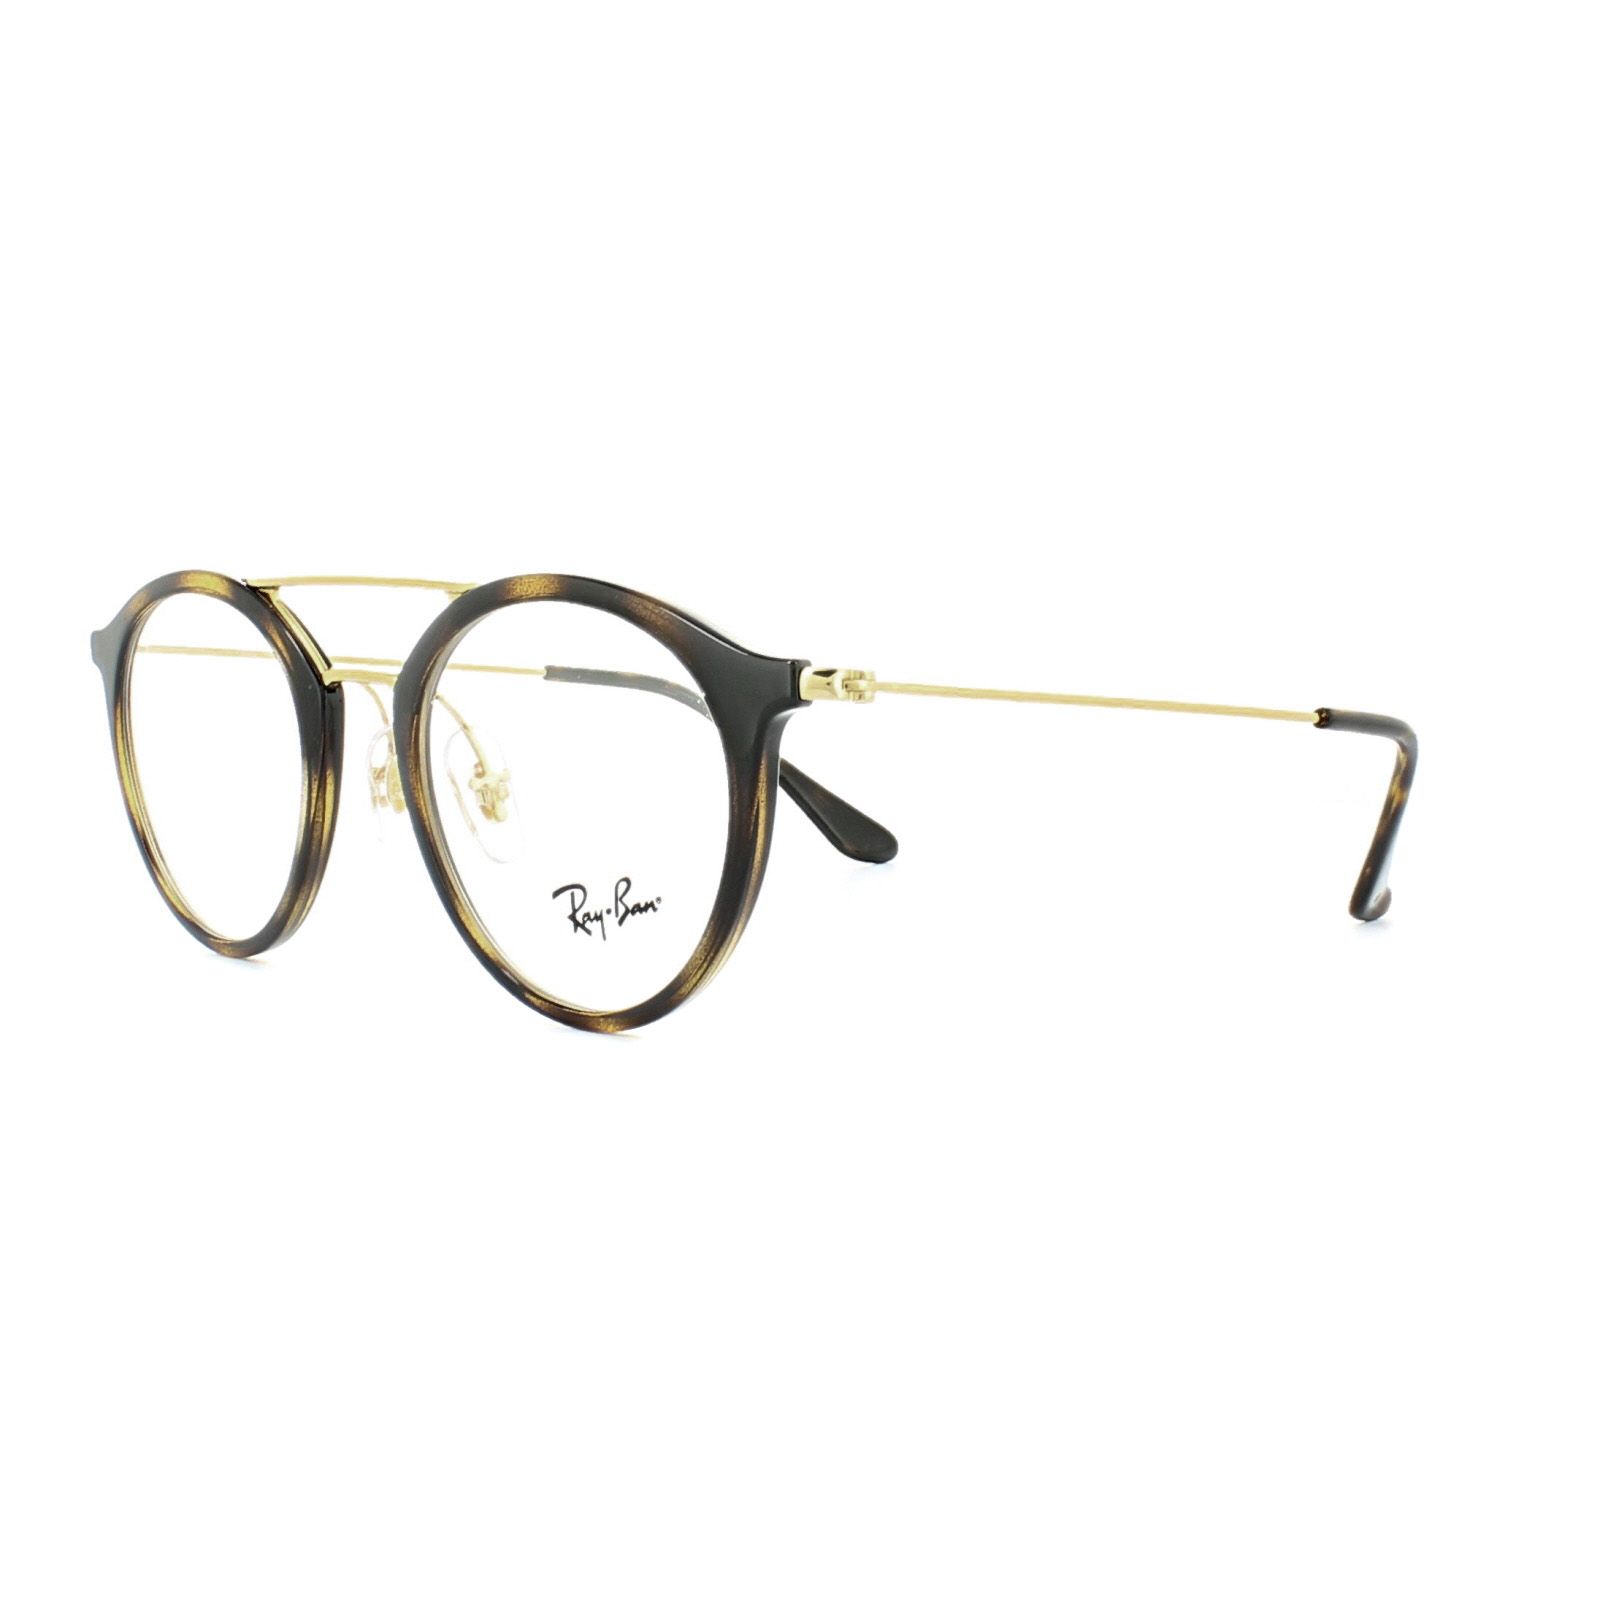 8363cc4a83a Sentinel Ray-Ban Glasses Frames 7097 2012 Dark Tortoise 49mm Mens